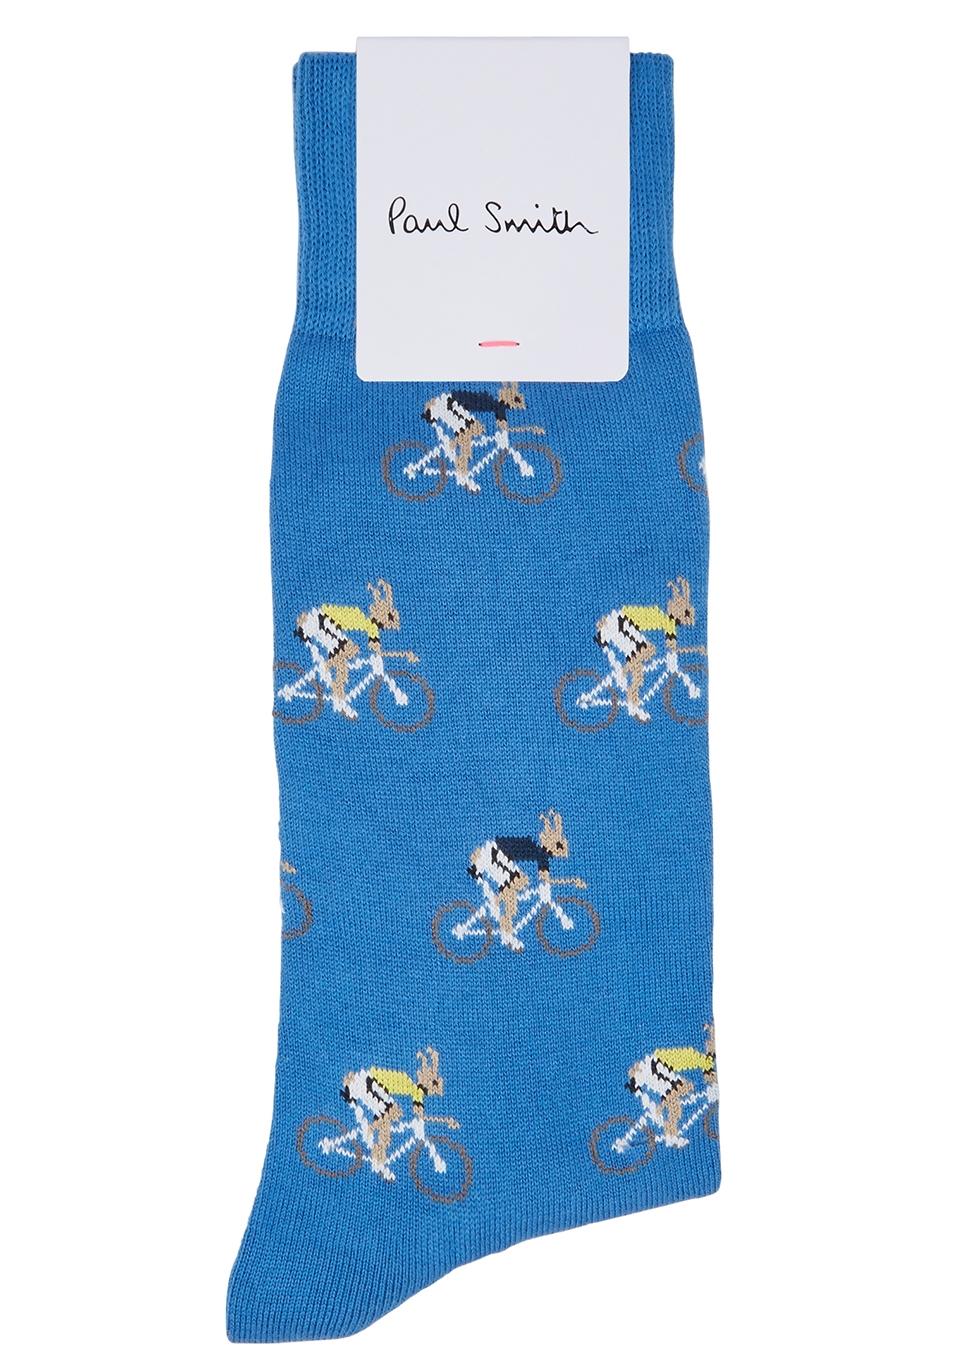 Blue intarsia cotton-blend socks - Paul Smith